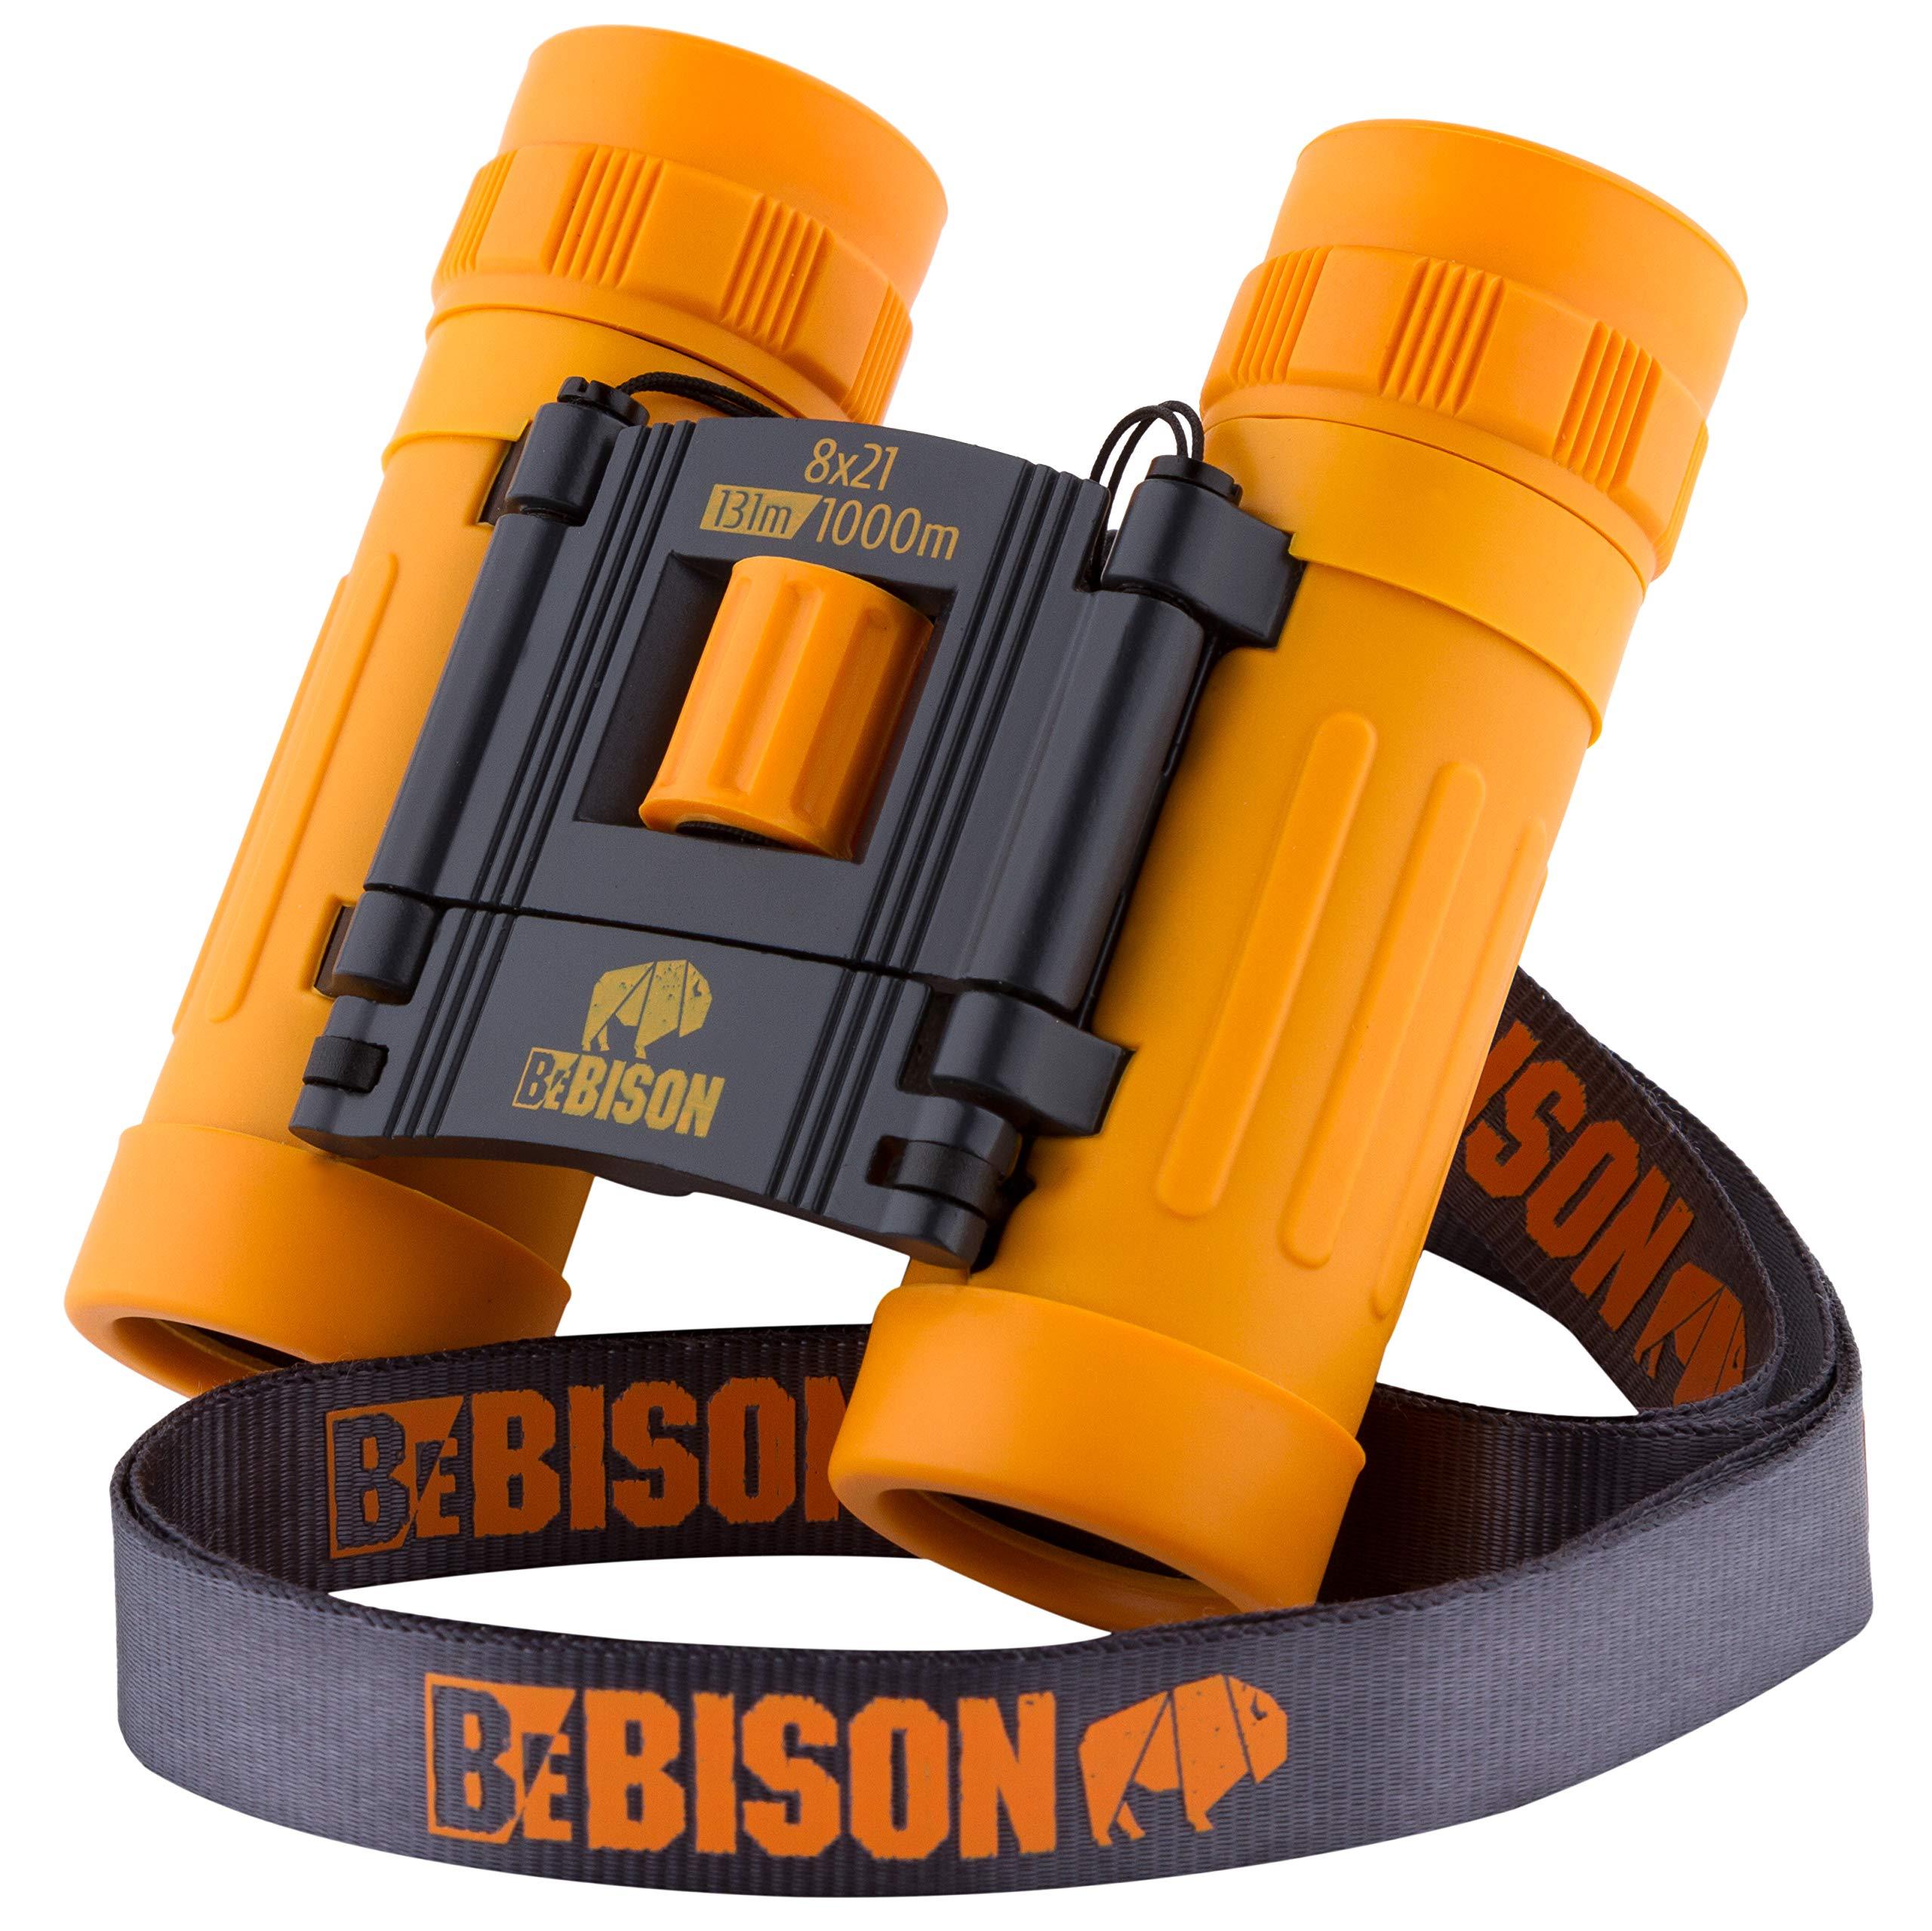 BeBison Zoom & Focus Binoculars - Play 8x21 Spy Binoculars for Kids and Adults - Compact Bird Watching Explorer Shockproof Binoculars - Premium Educational & Long range Binoculars for Nature Discovery by BeBISON